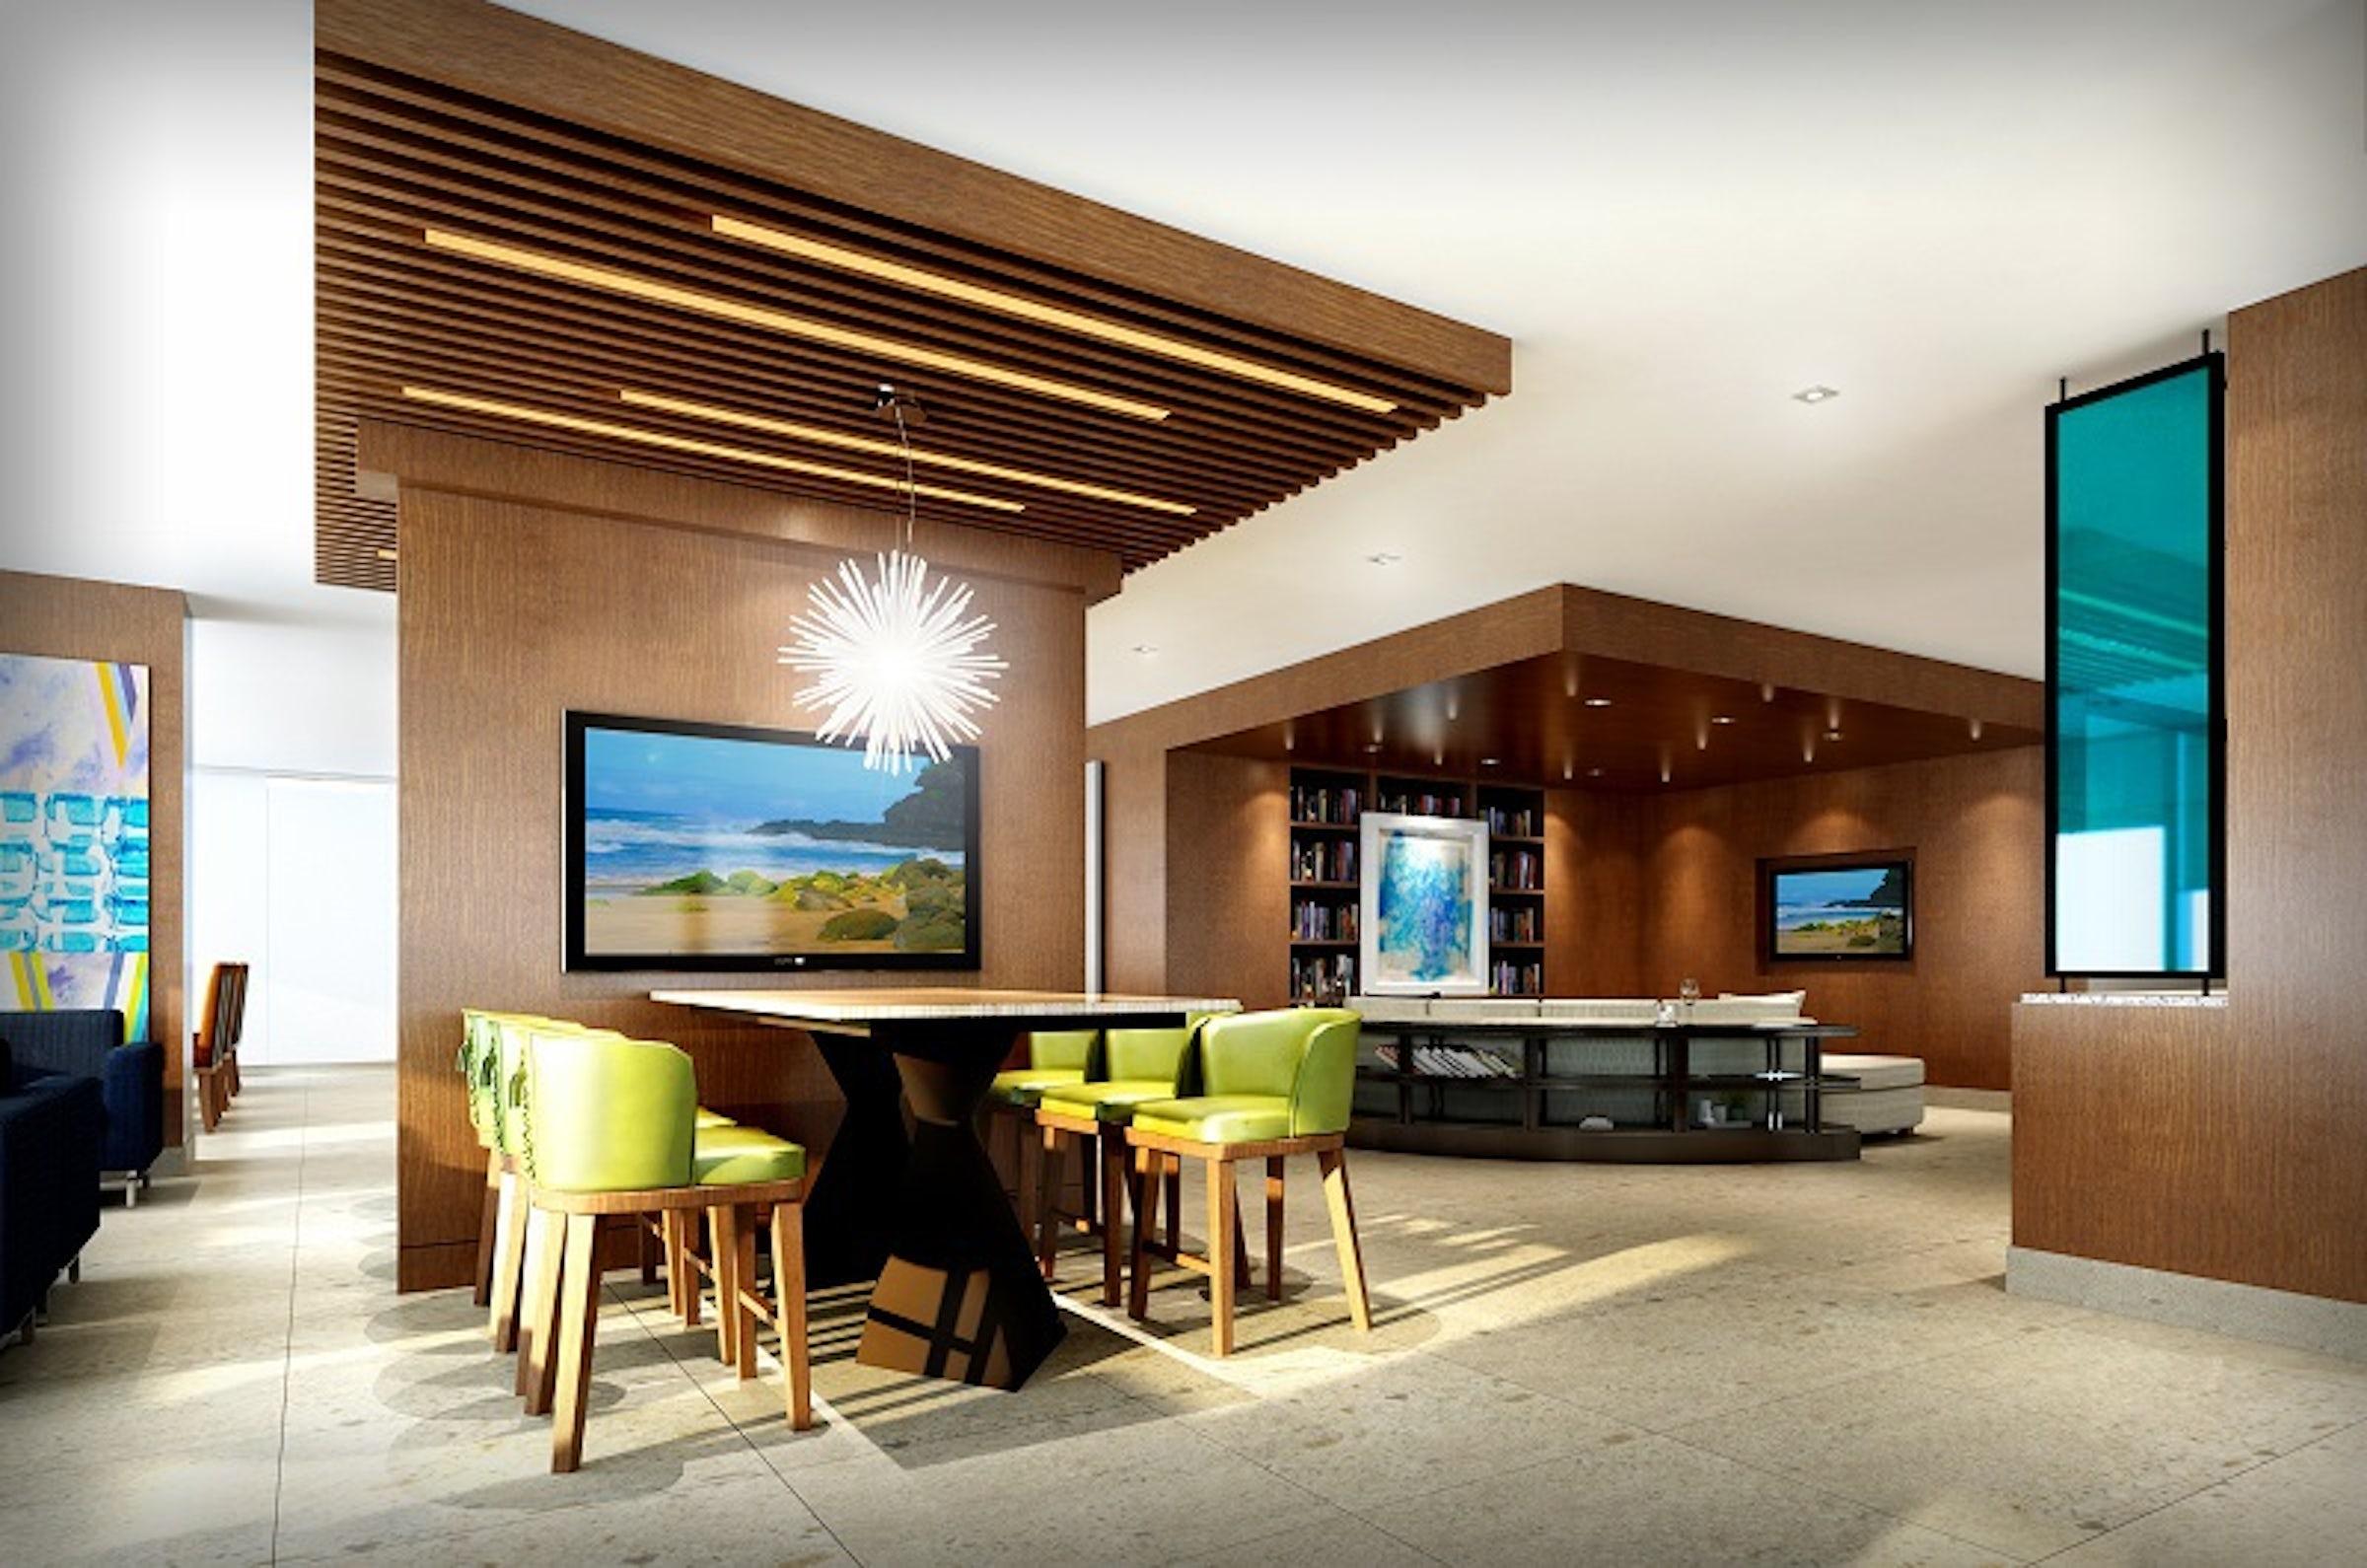 Residence Inn by Marriott Dallas Downtown in Beyond Dallas